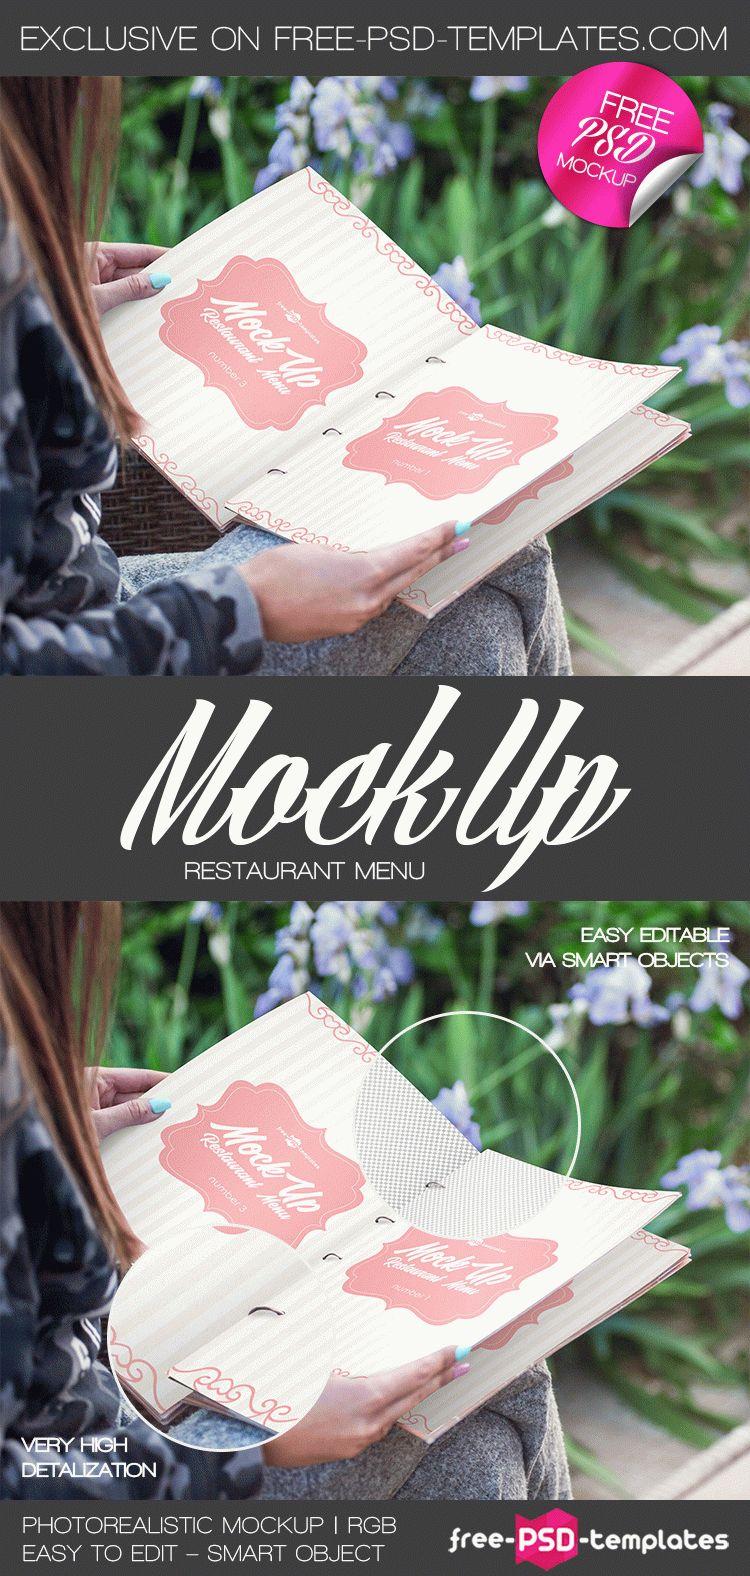 Free Restaurant Menu Mockup In PSD Free PSD Templates - Menu mockup template